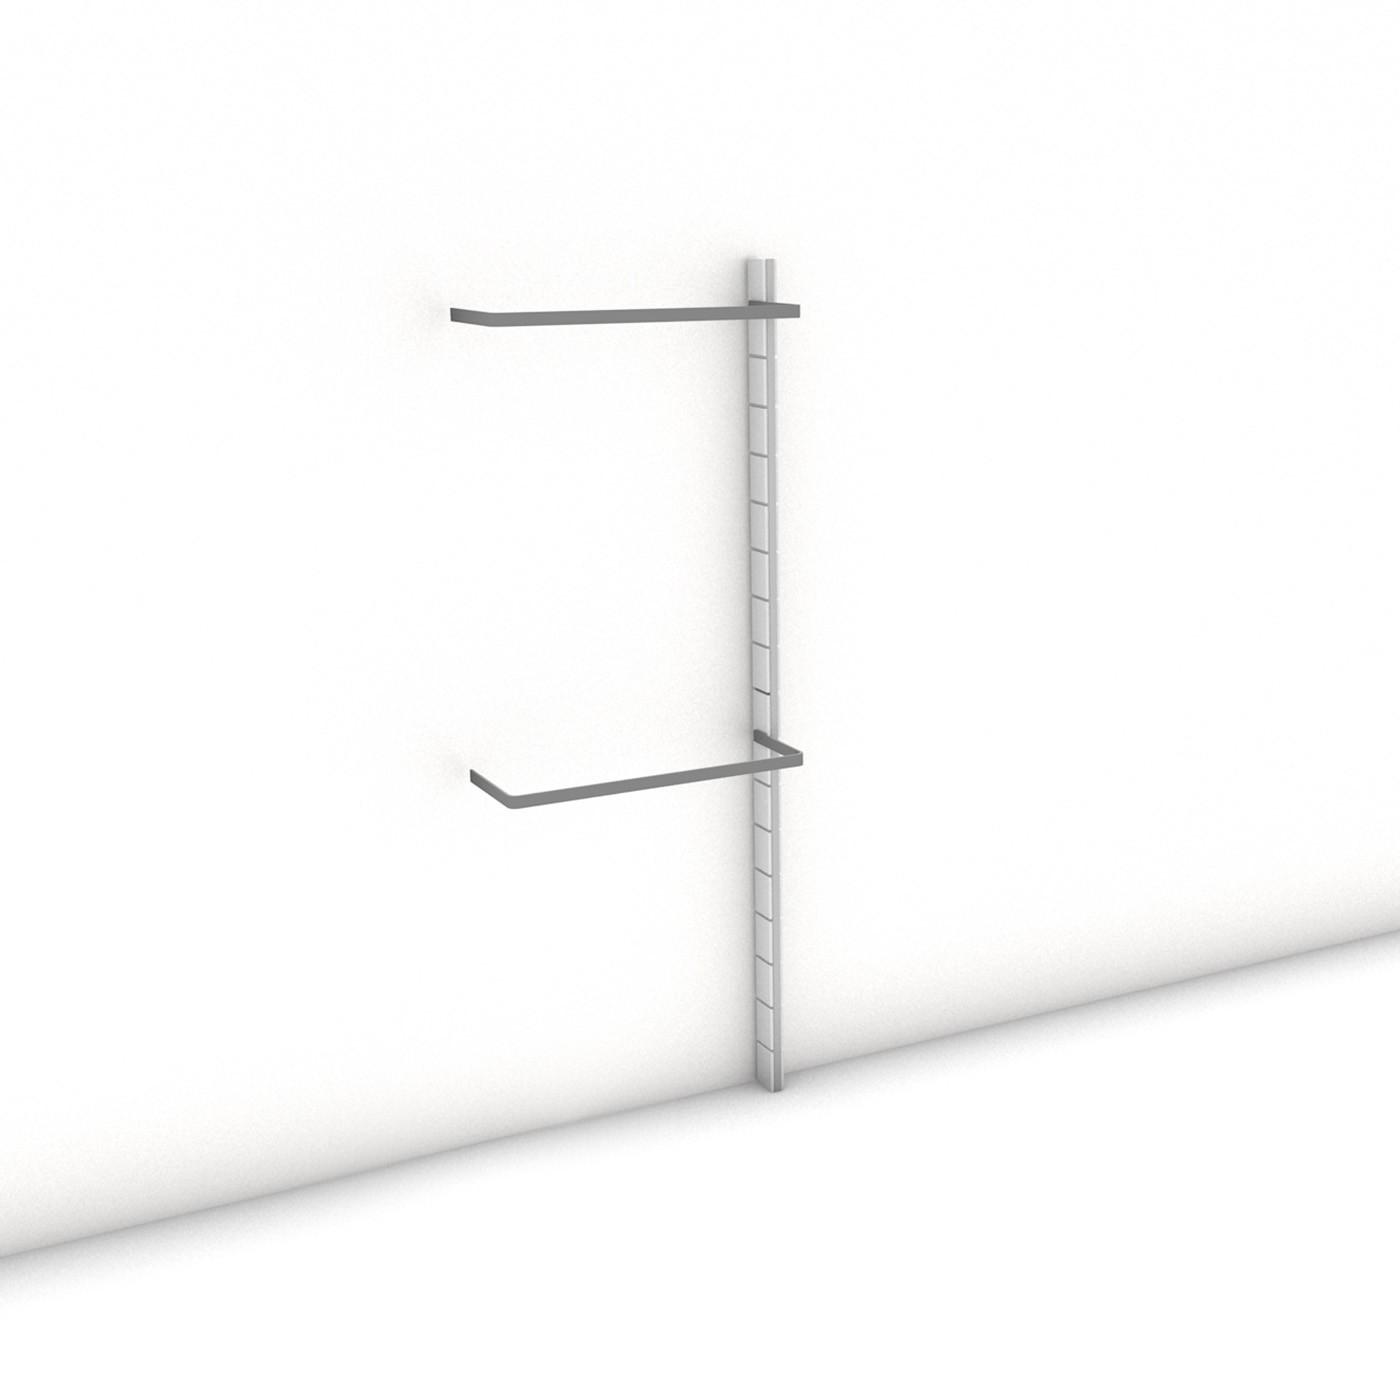 Begehbarer kleiderschrank maße  Begehbarer Kleiderschrank - Prime (XL) 81 - Anbauelement HANG-UP ...